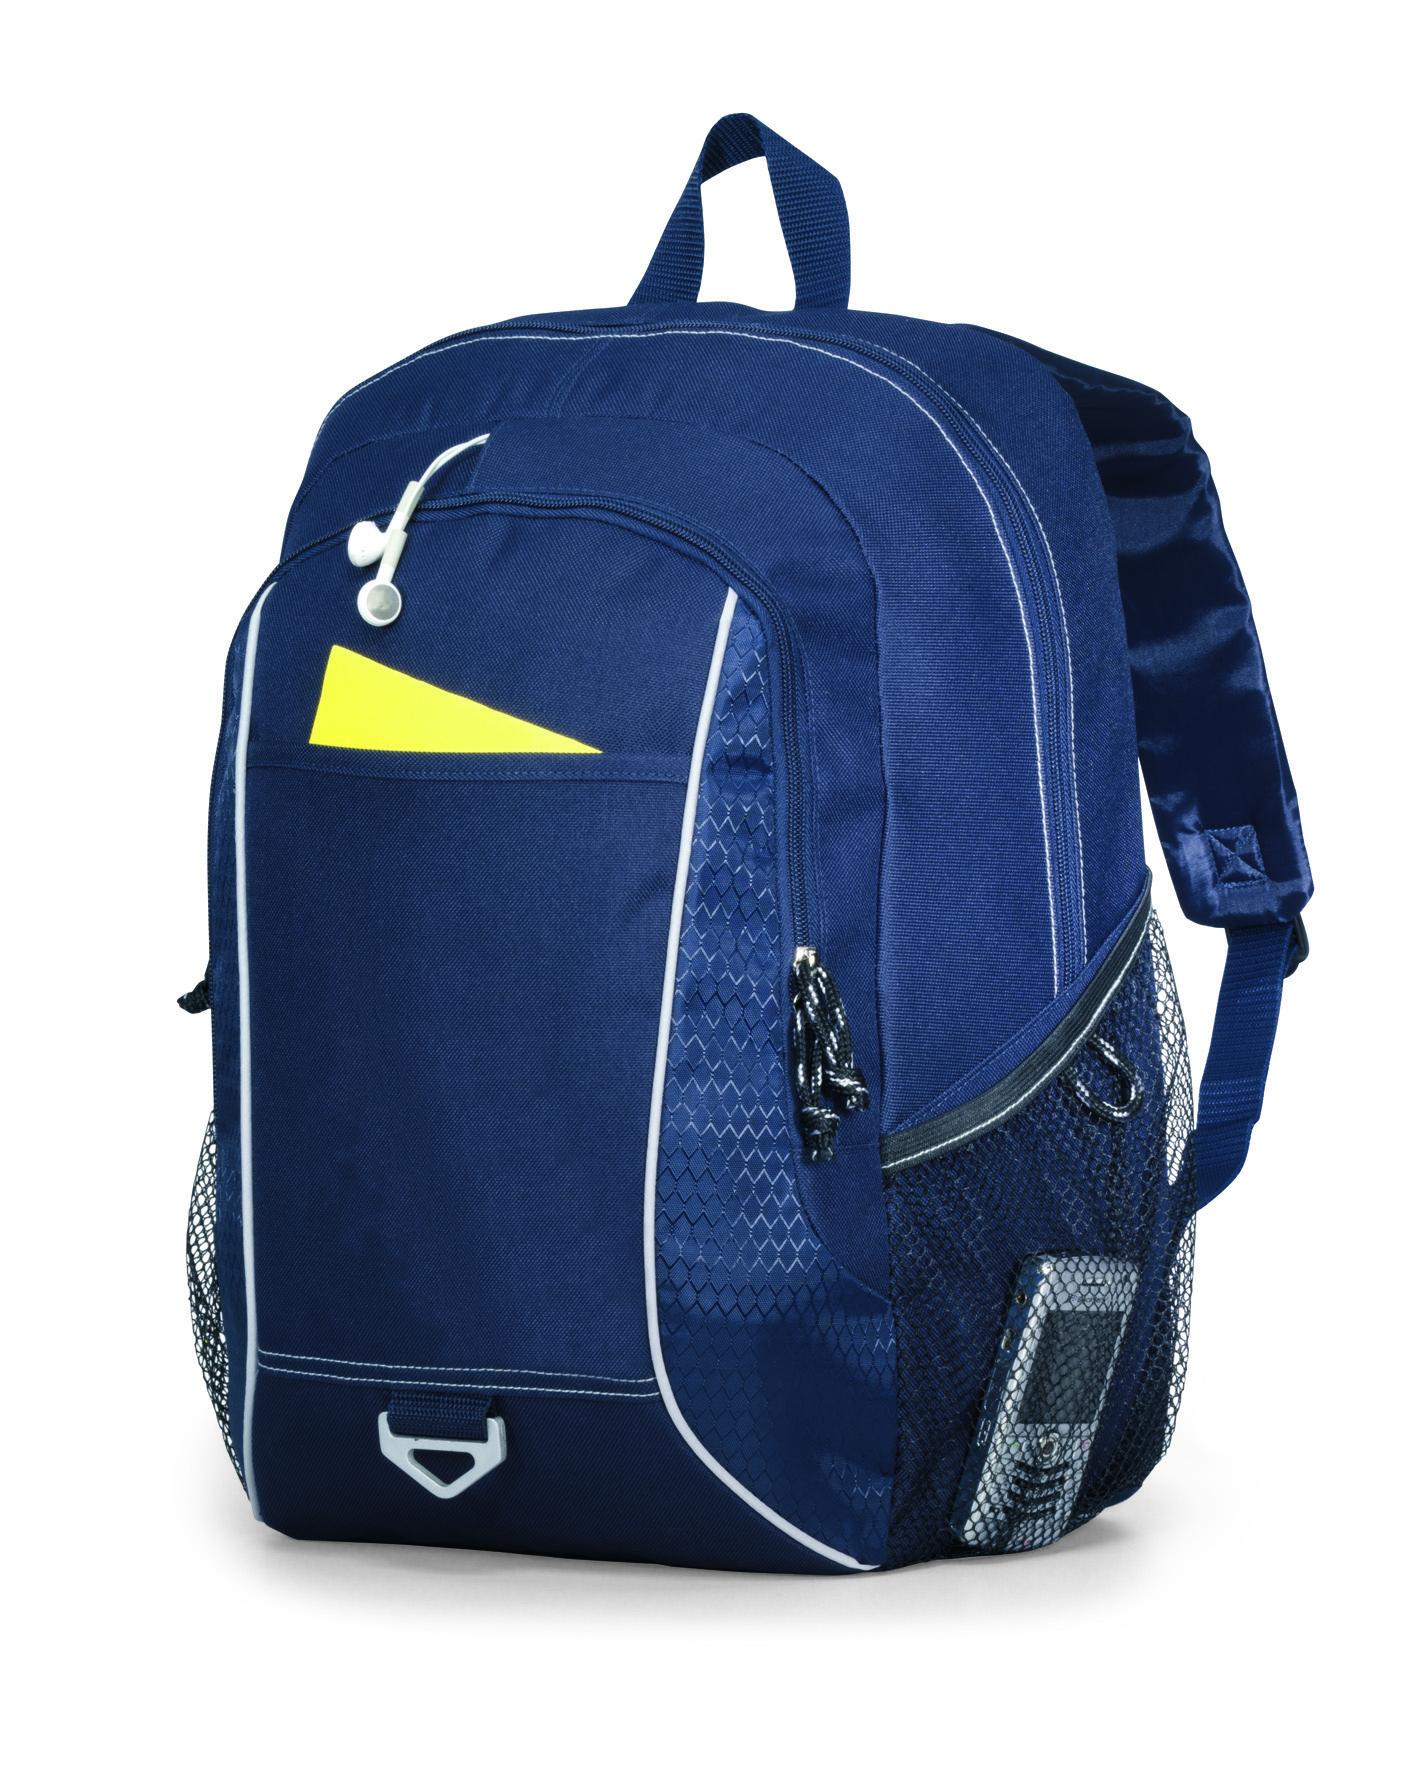 Gemline 5411 - Atlas Computer Backpack